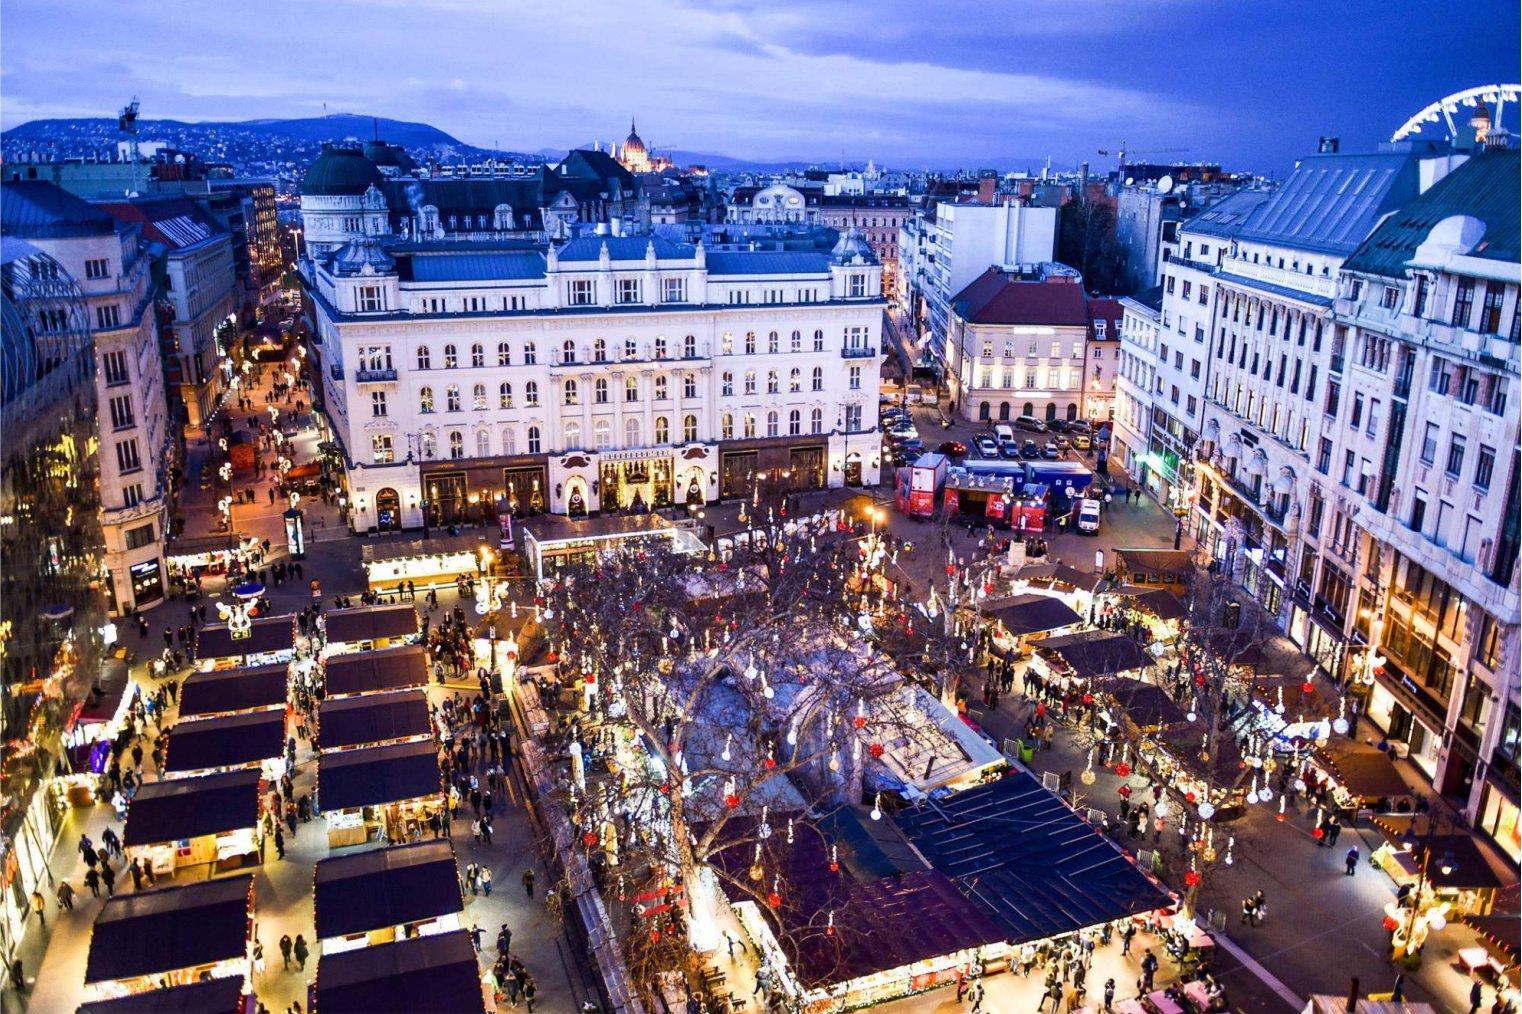 Budapest Christmas Fair. Рождественская ярмарка, Будапешт